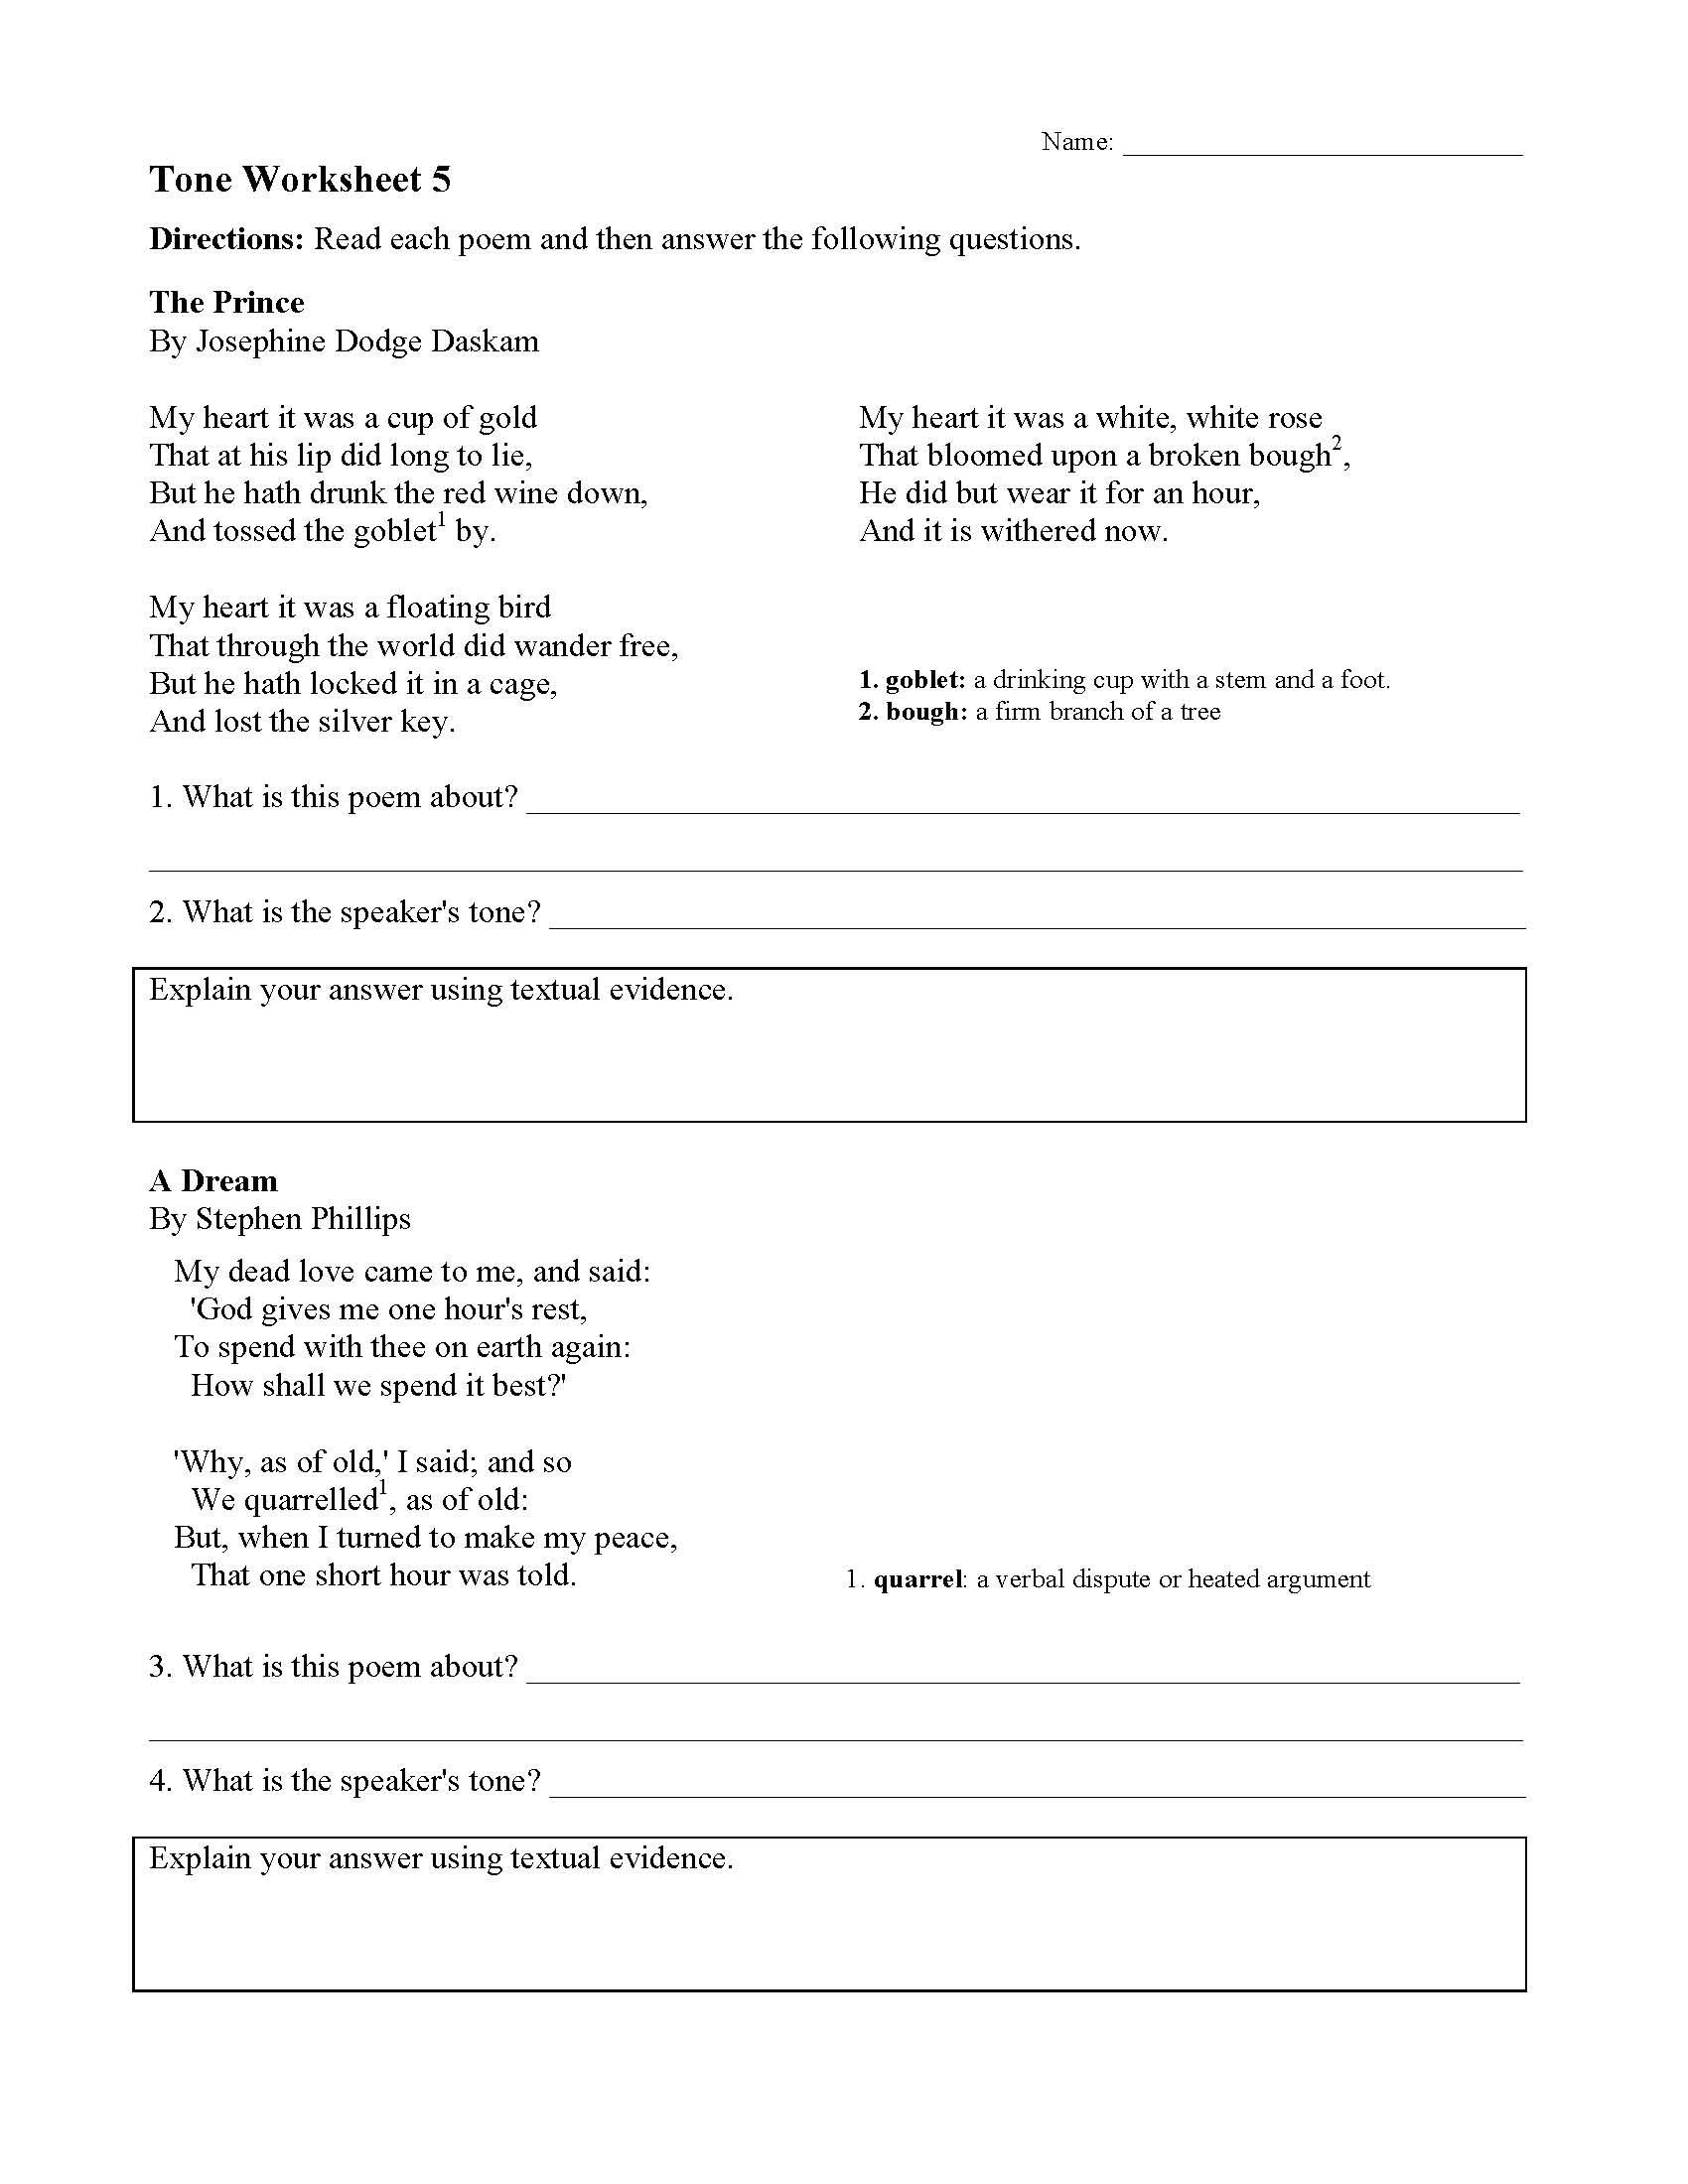 Tone Worksheet 5